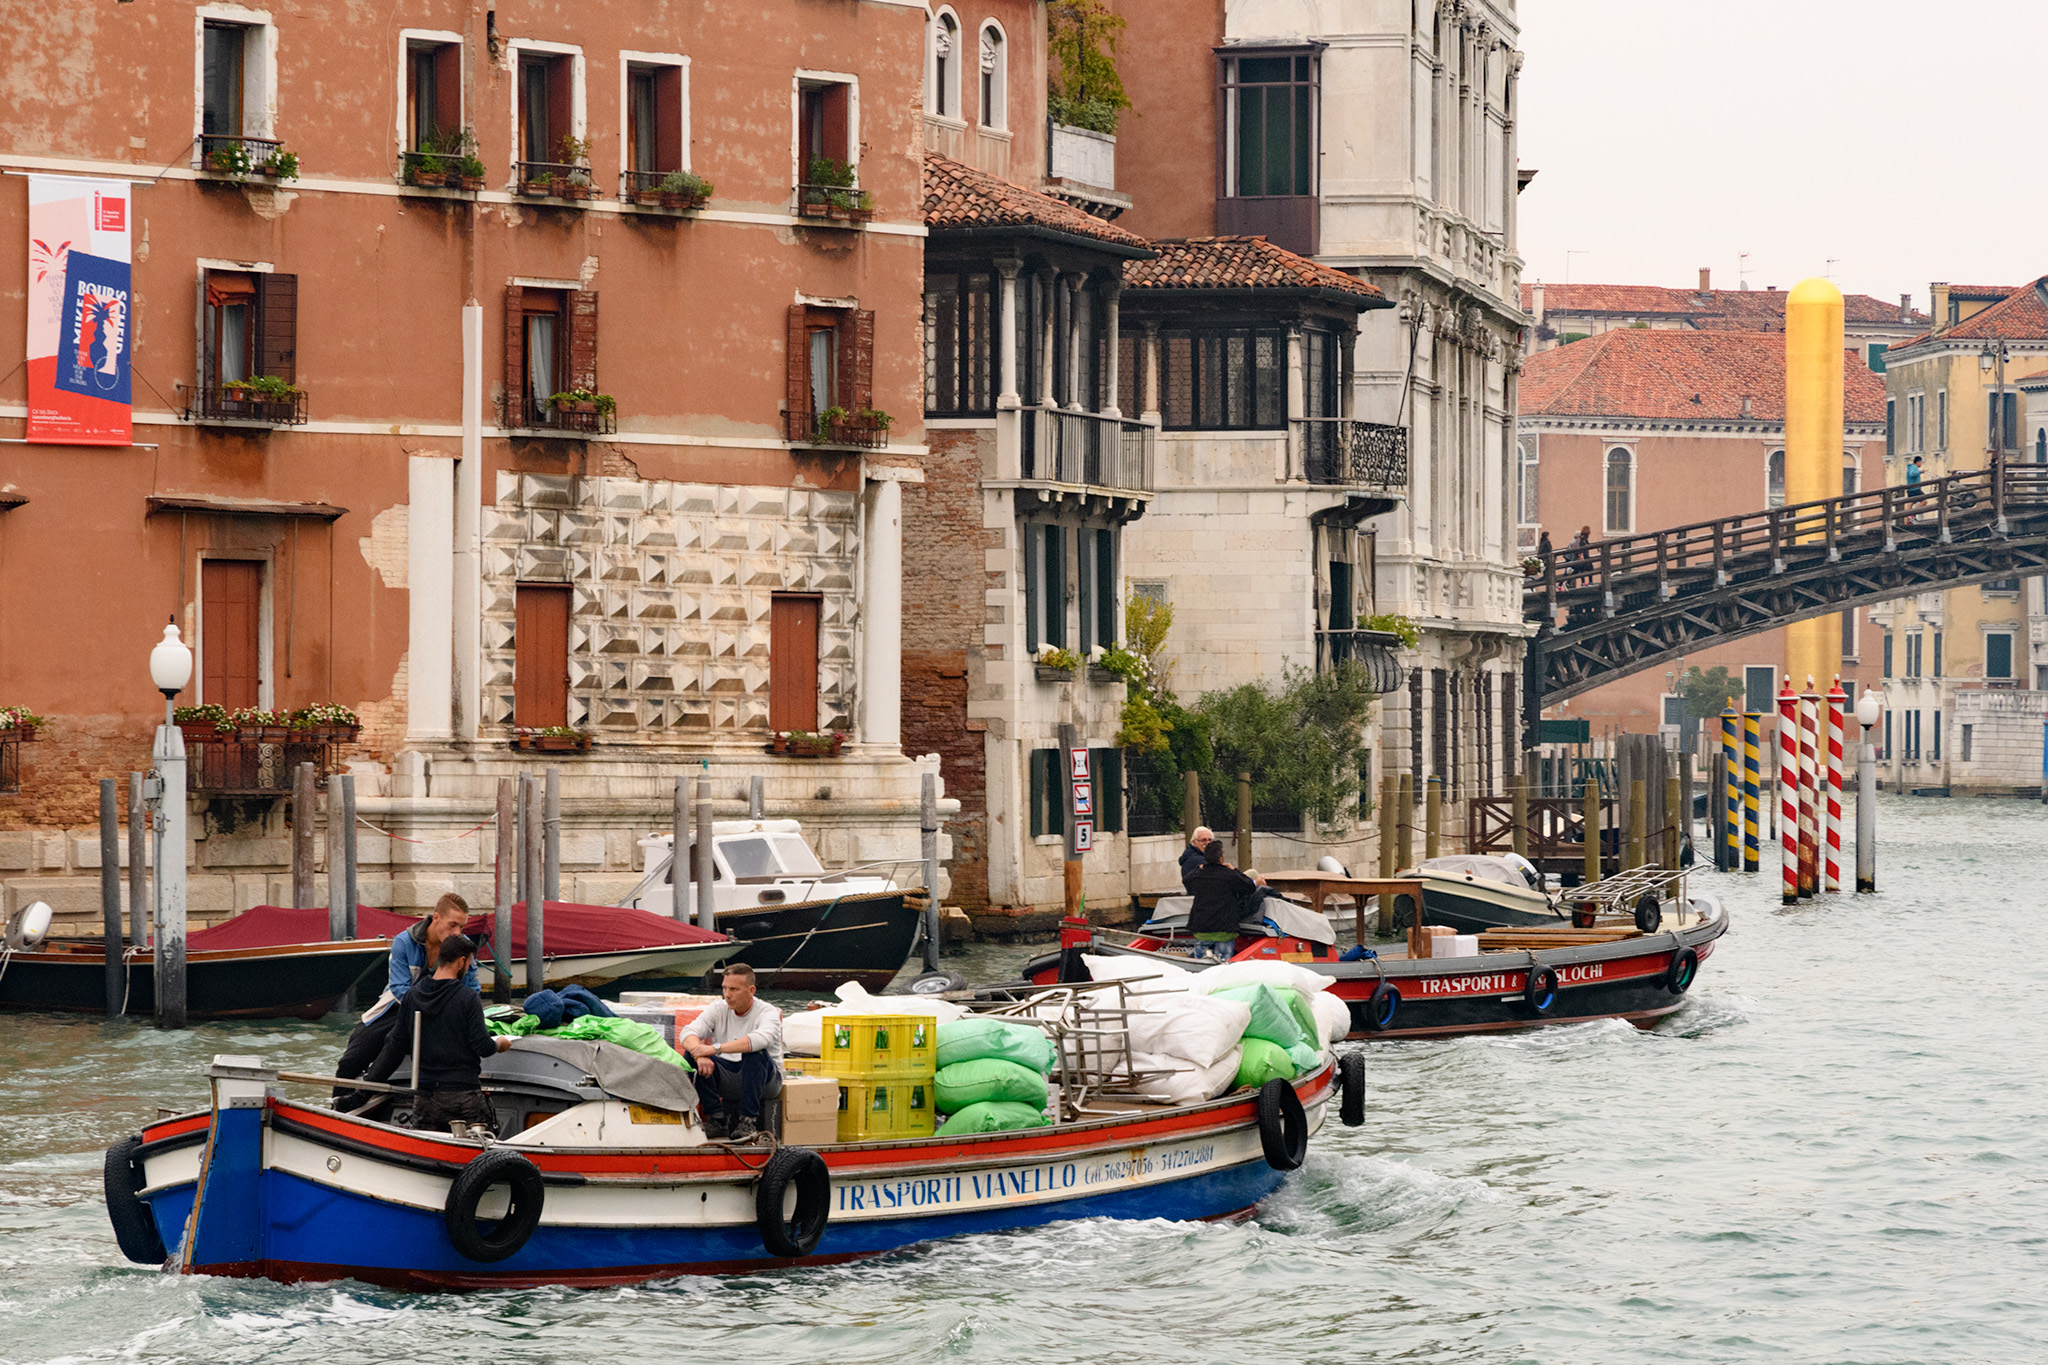 20171003 - Venice - 009.jpg